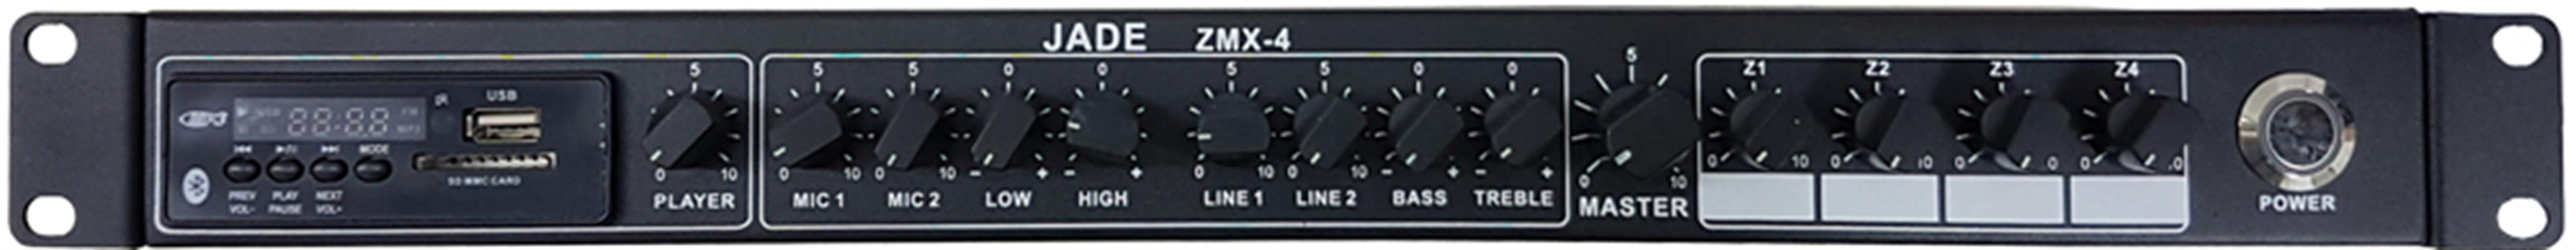 ZMX-4 מיקסר אזורים,ל- 4 אזורי השמעה וכולל נגן מובנה